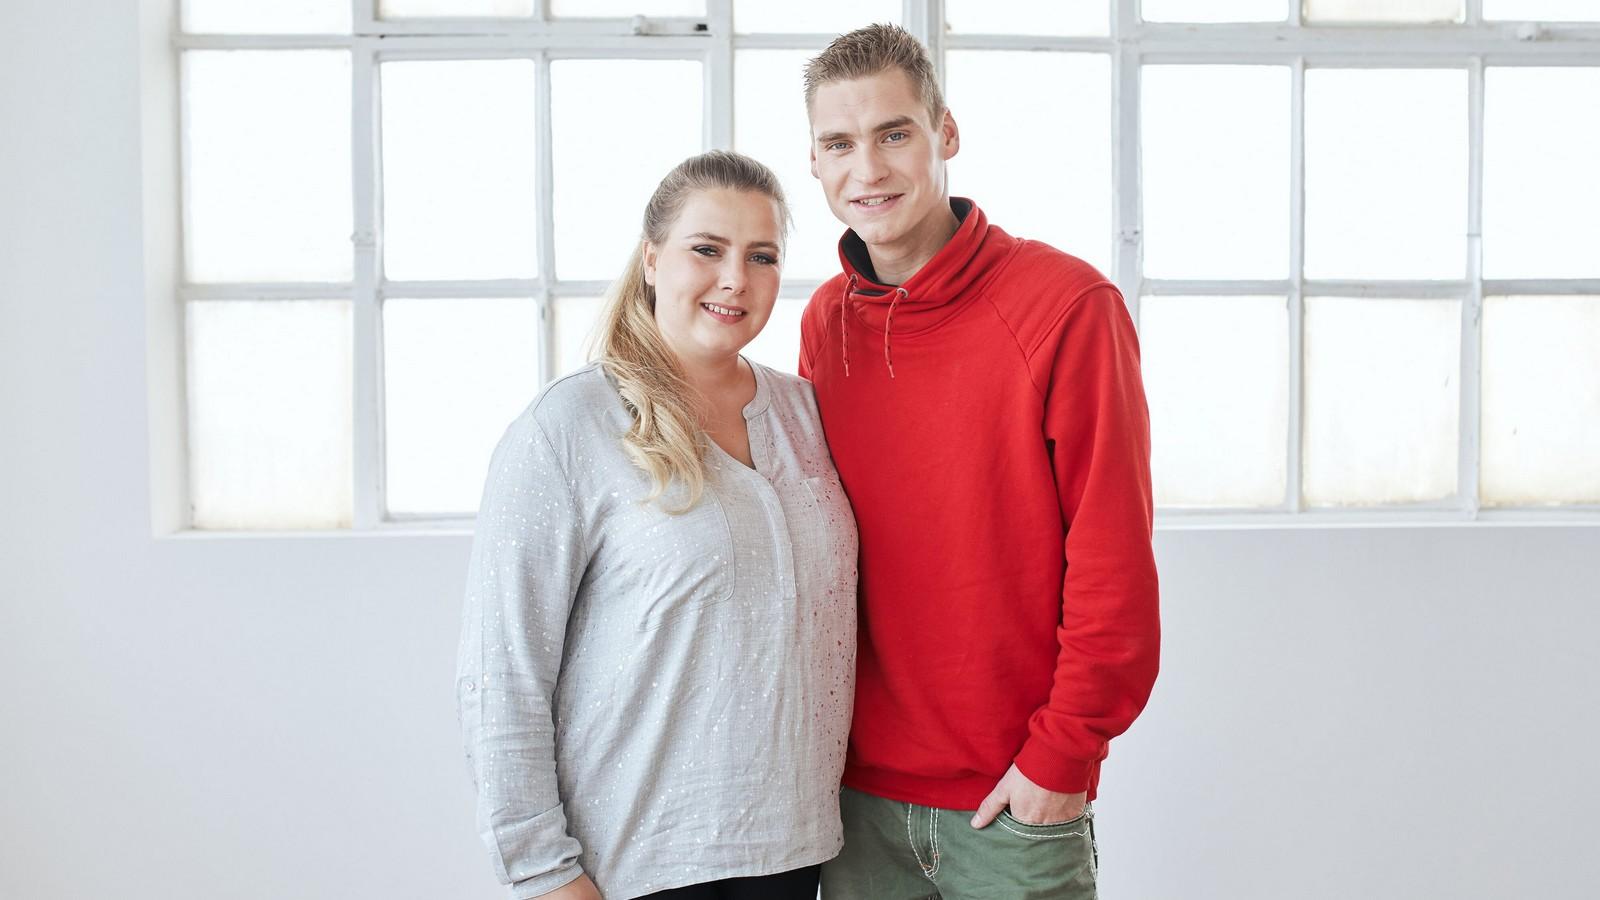 Sarafina und Peter Wollny